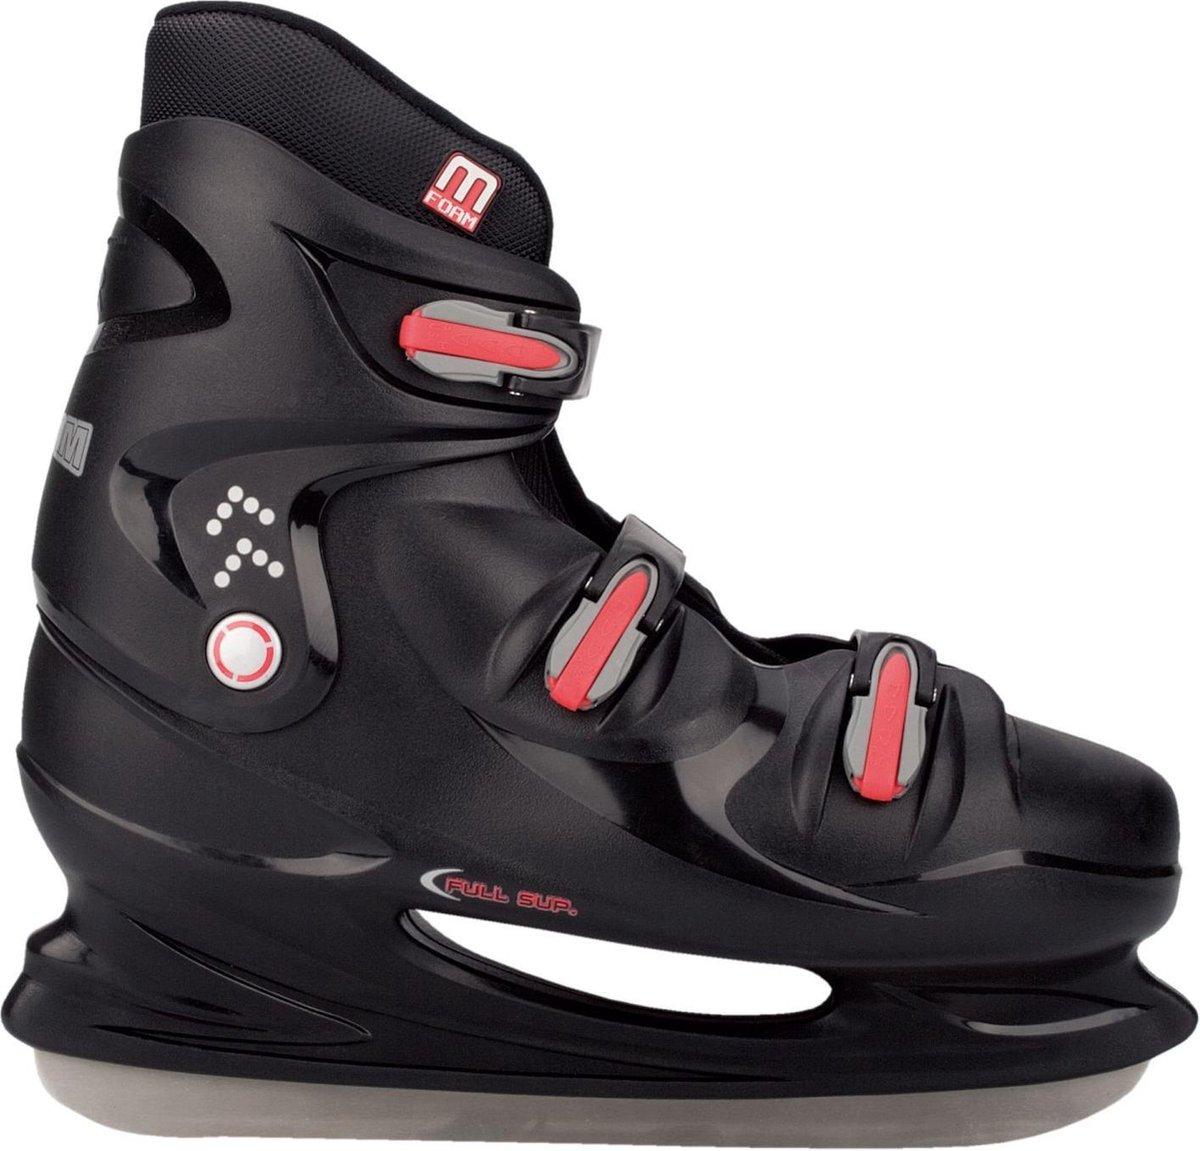 Nijdam IJshockeyschaats XXL - Hardboot - Zwart/Zilver/Rood - 49